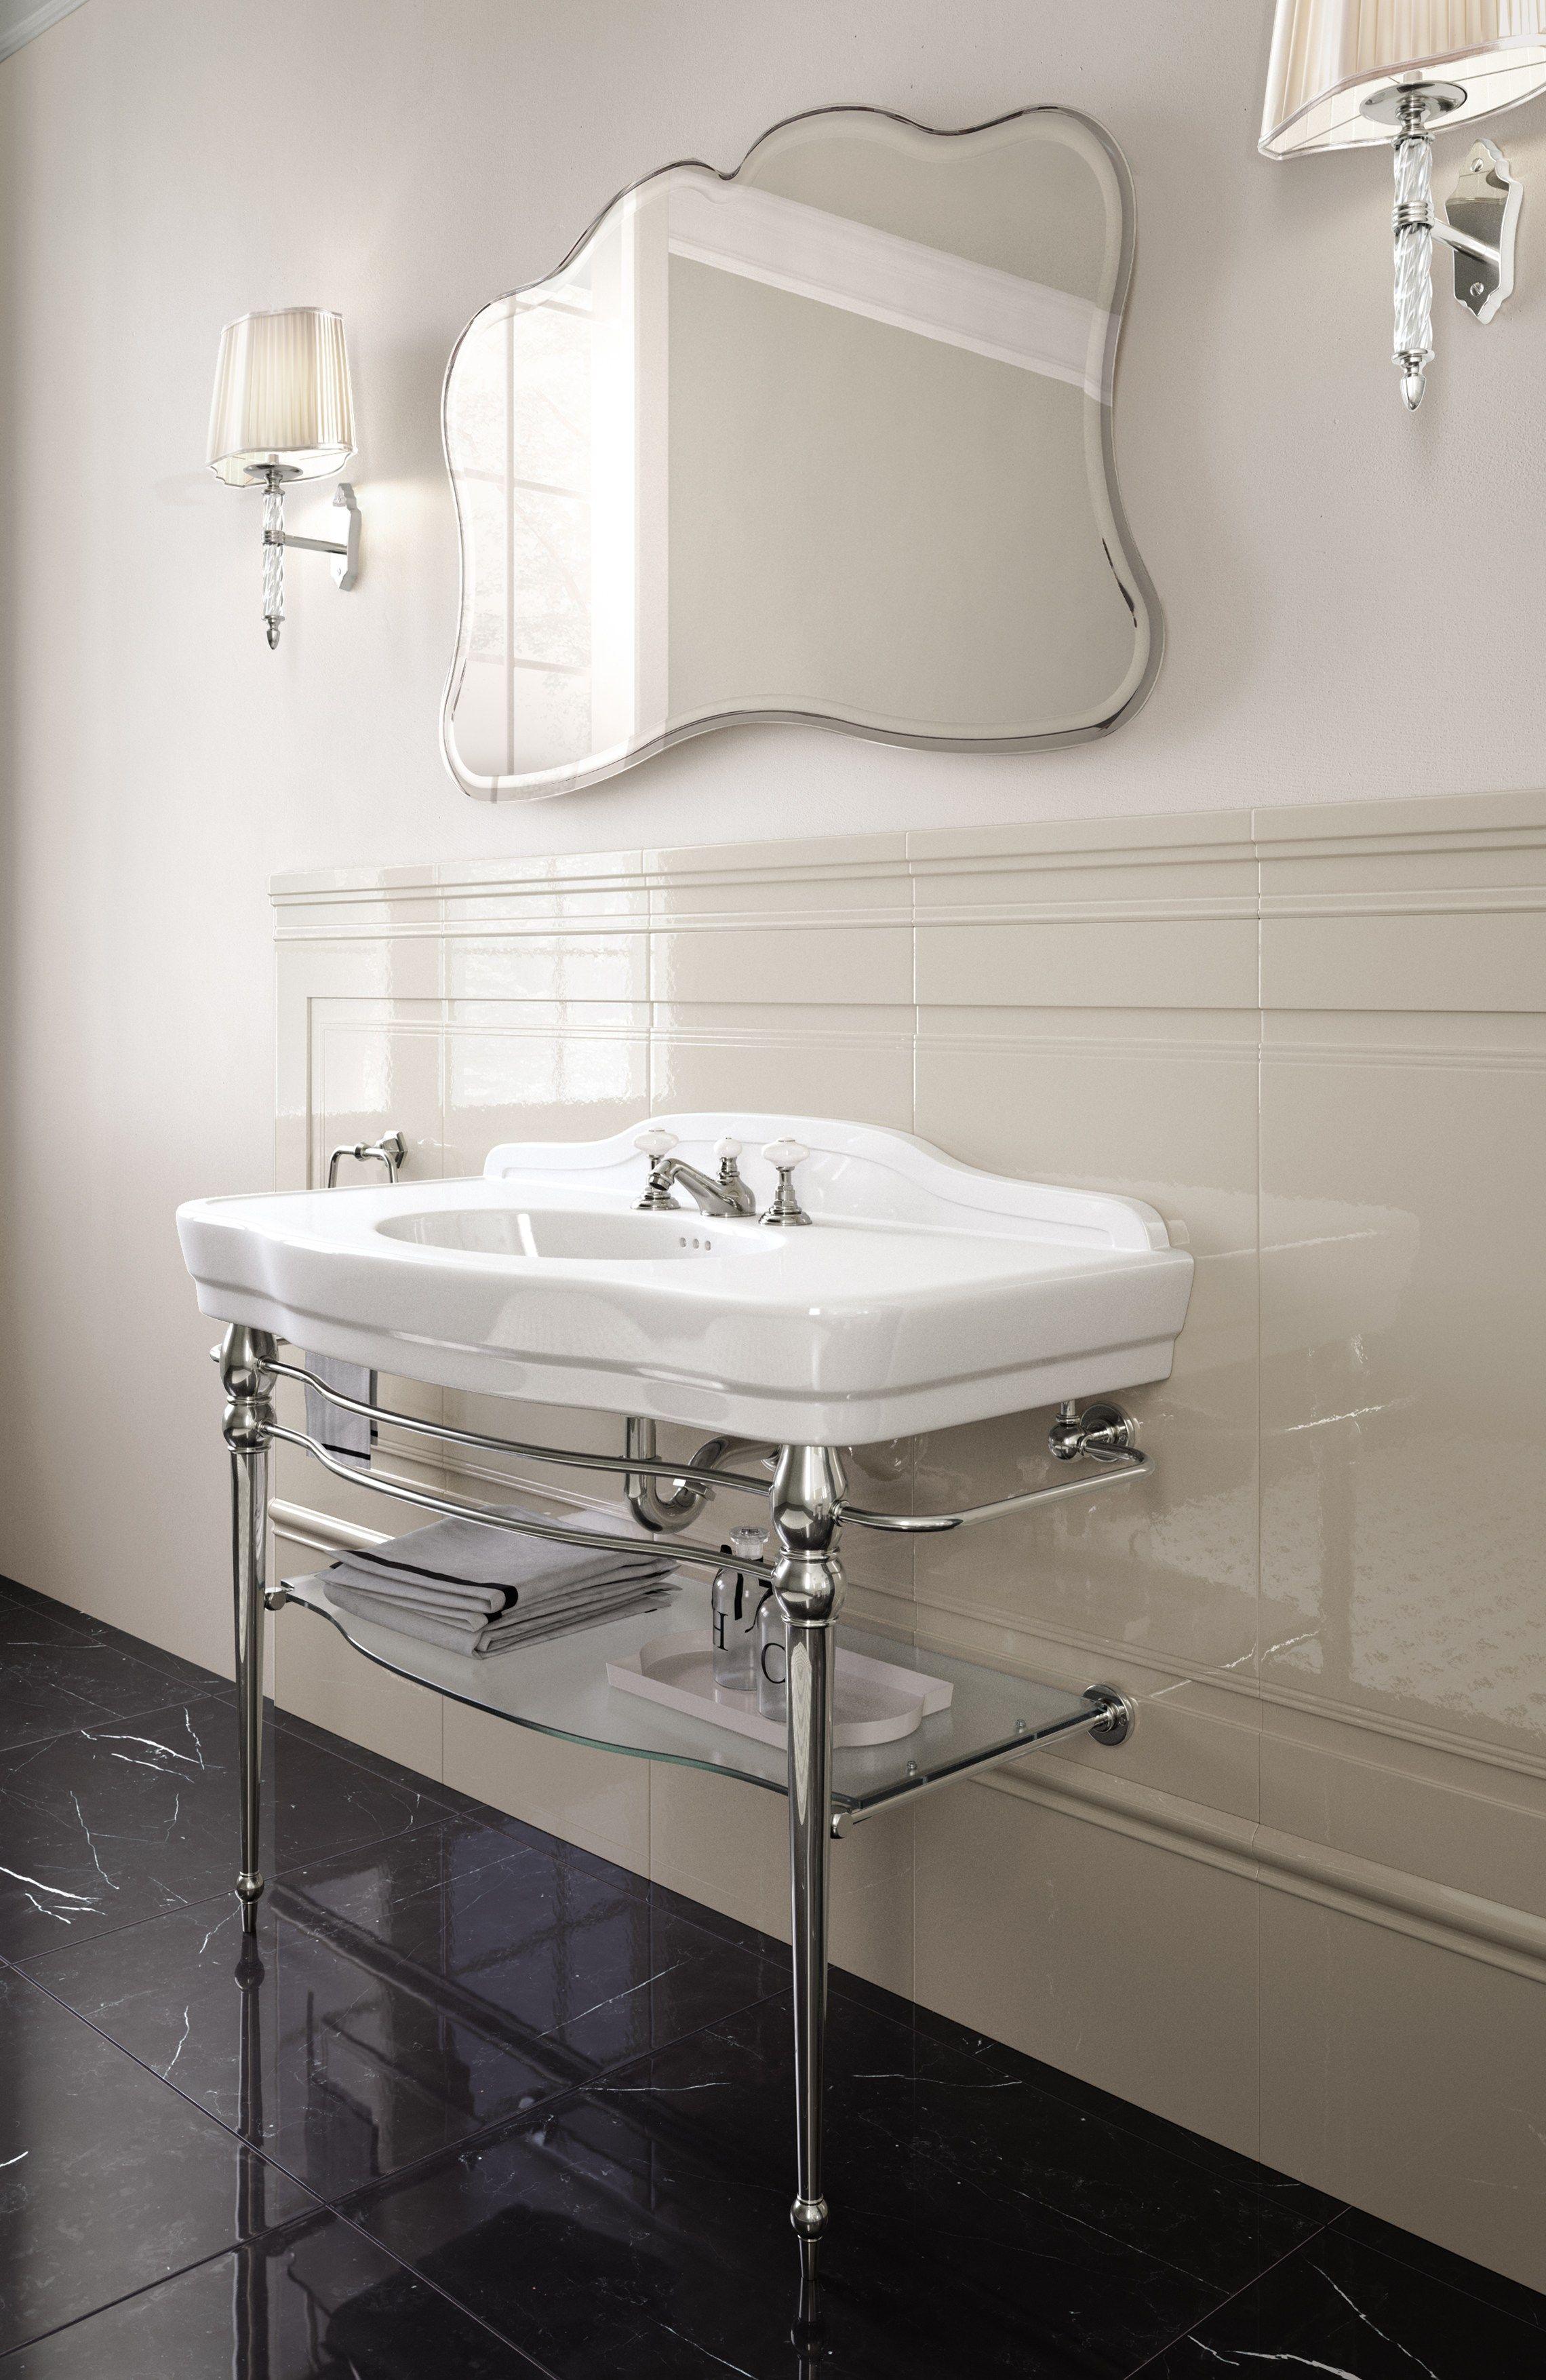 lavabo console avec porte serviettes melody by devon devon. Black Bedroom Furniture Sets. Home Design Ideas